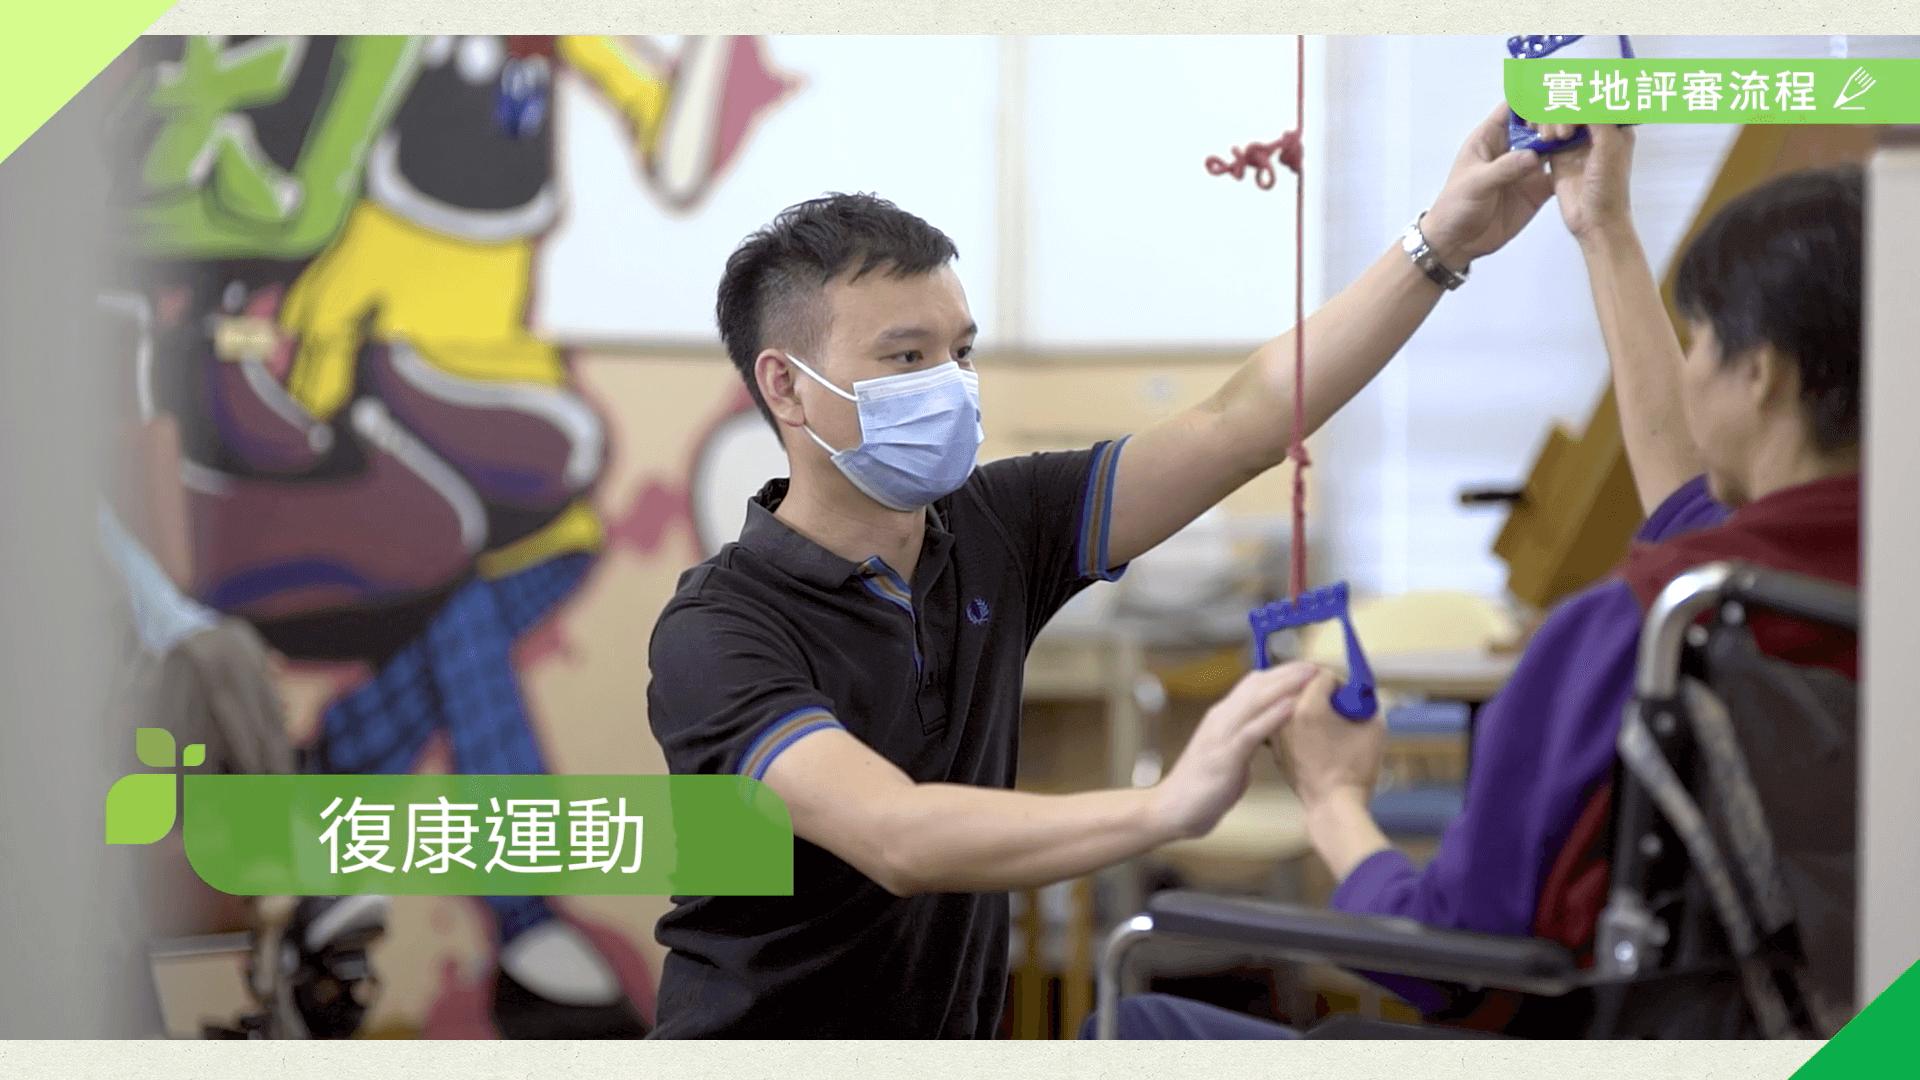 The Hong Kong Association of Gerontology